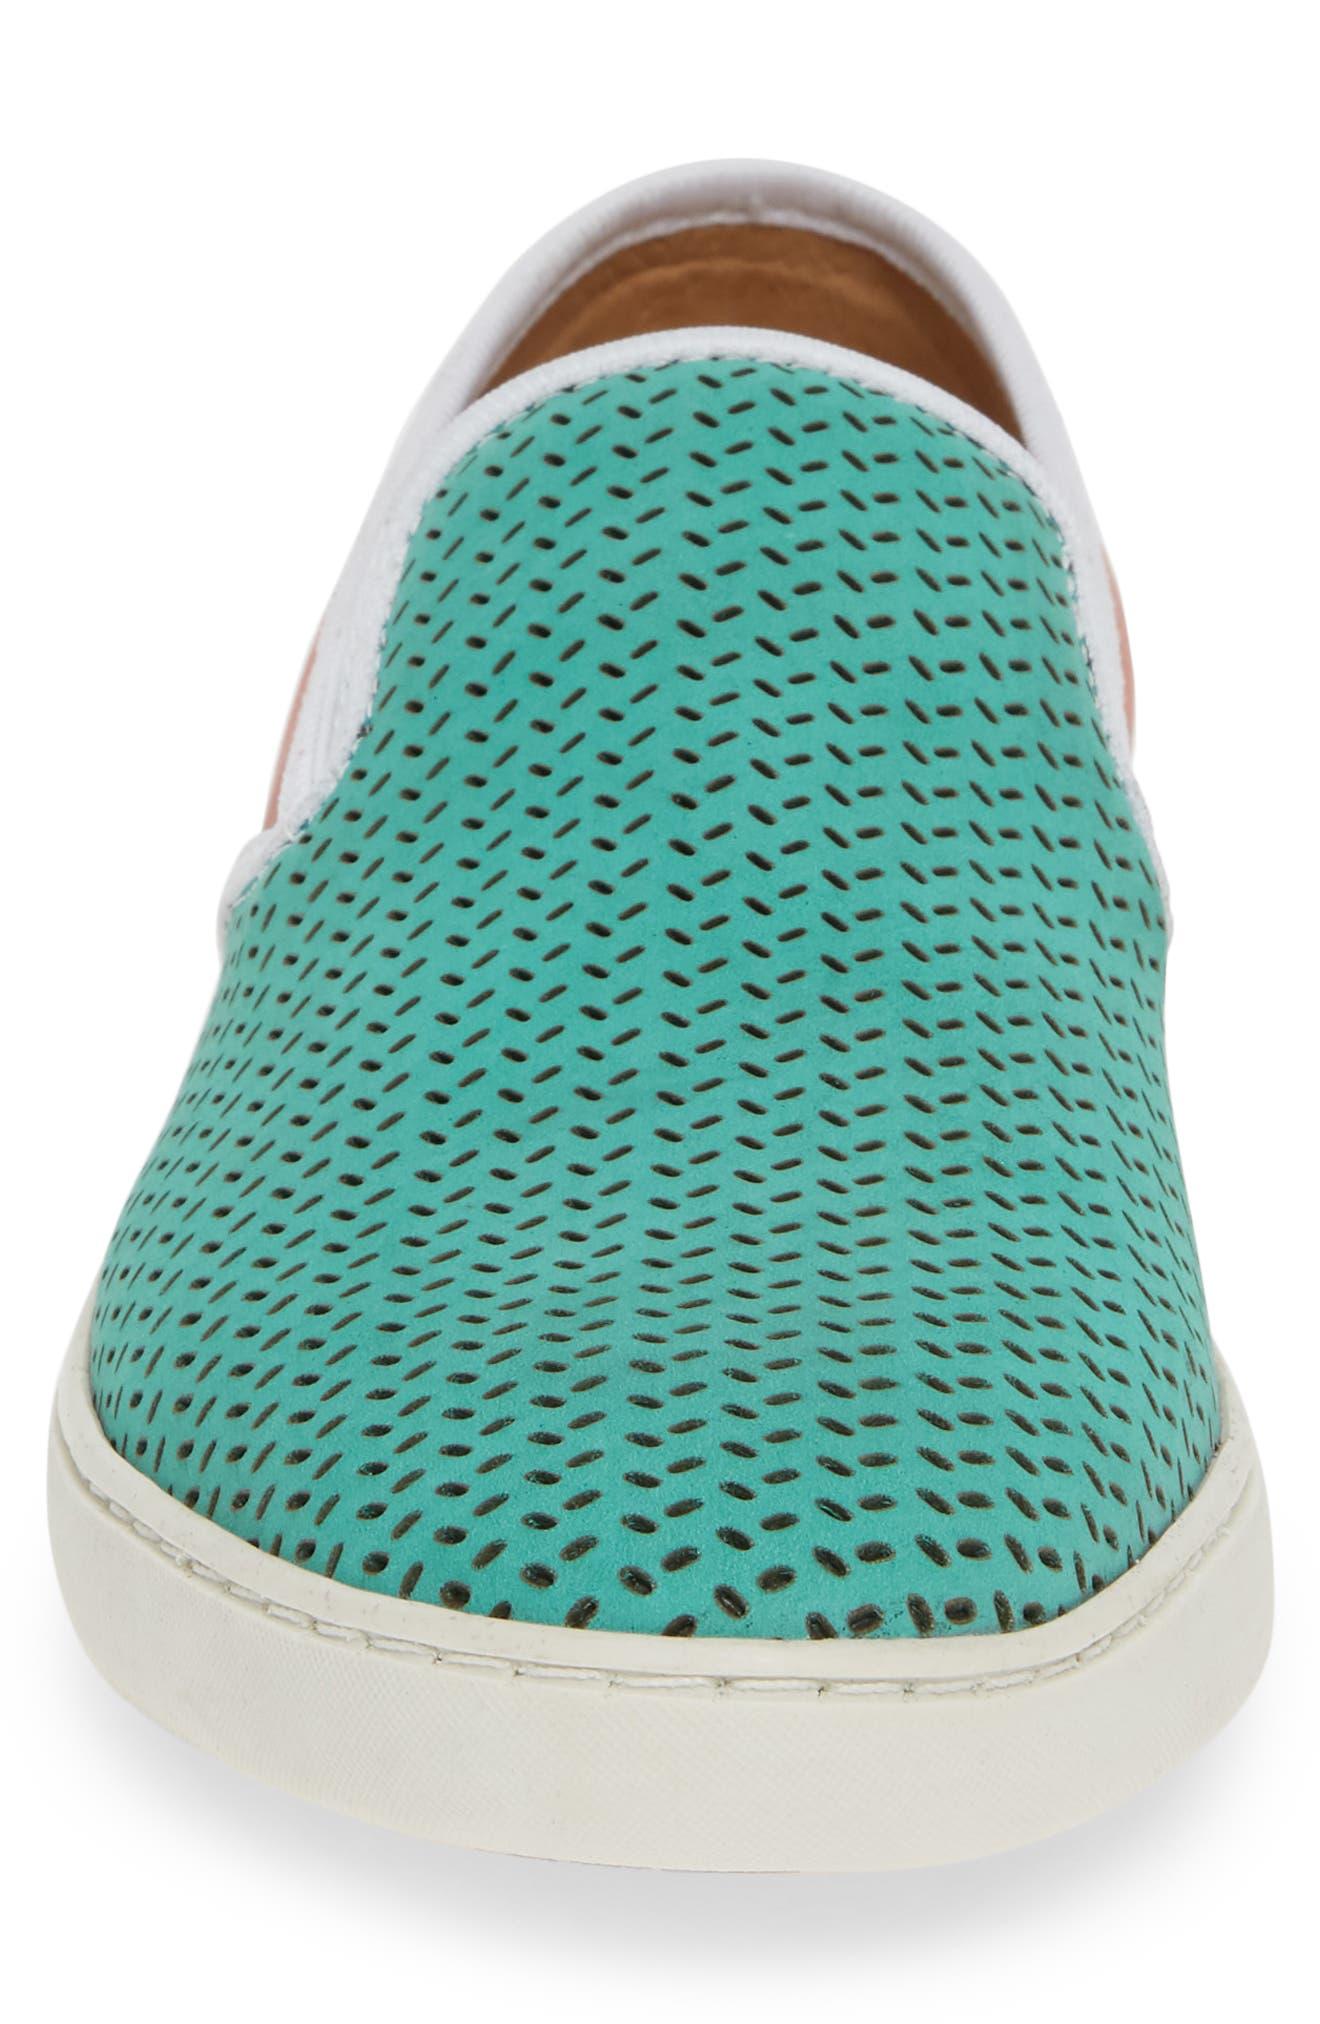 Malibu Perforated Loafer,                             Alternate thumbnail 4, color,                             AQUA/PINK NUBUCK